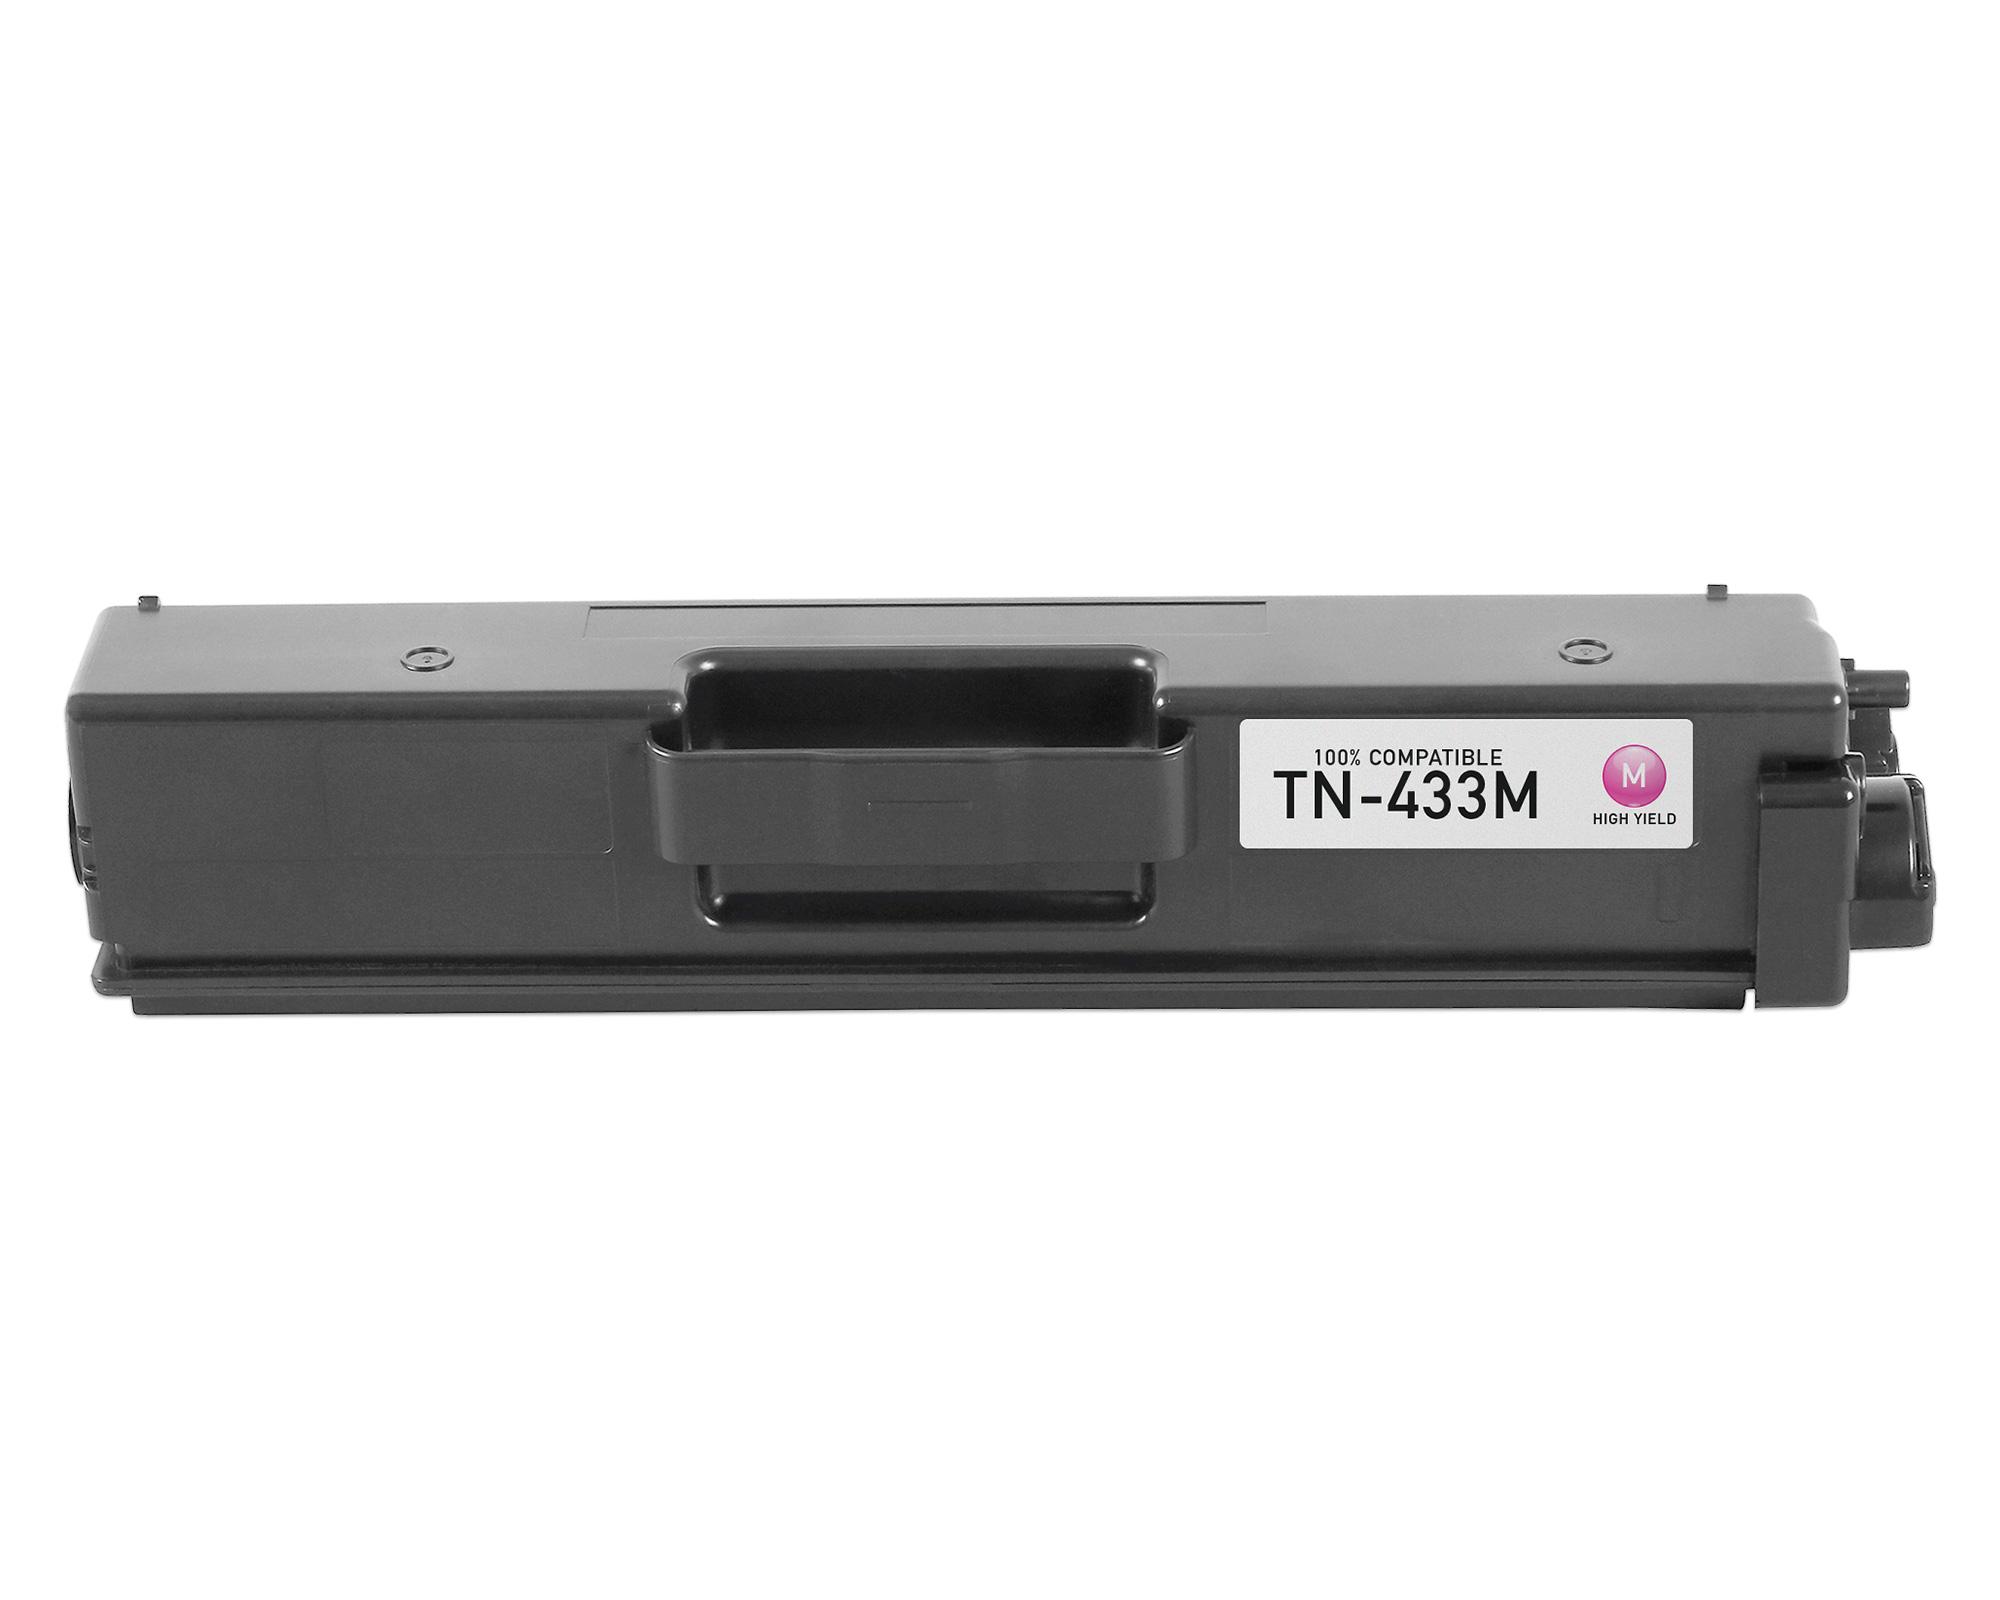 Brother MFC-L8900CDW Magenta Toner Cartridge - 4,000 Pages -  Generic Toner, Magenta-Toner-Cartridge-High-Yield-Brother-MFC-L89